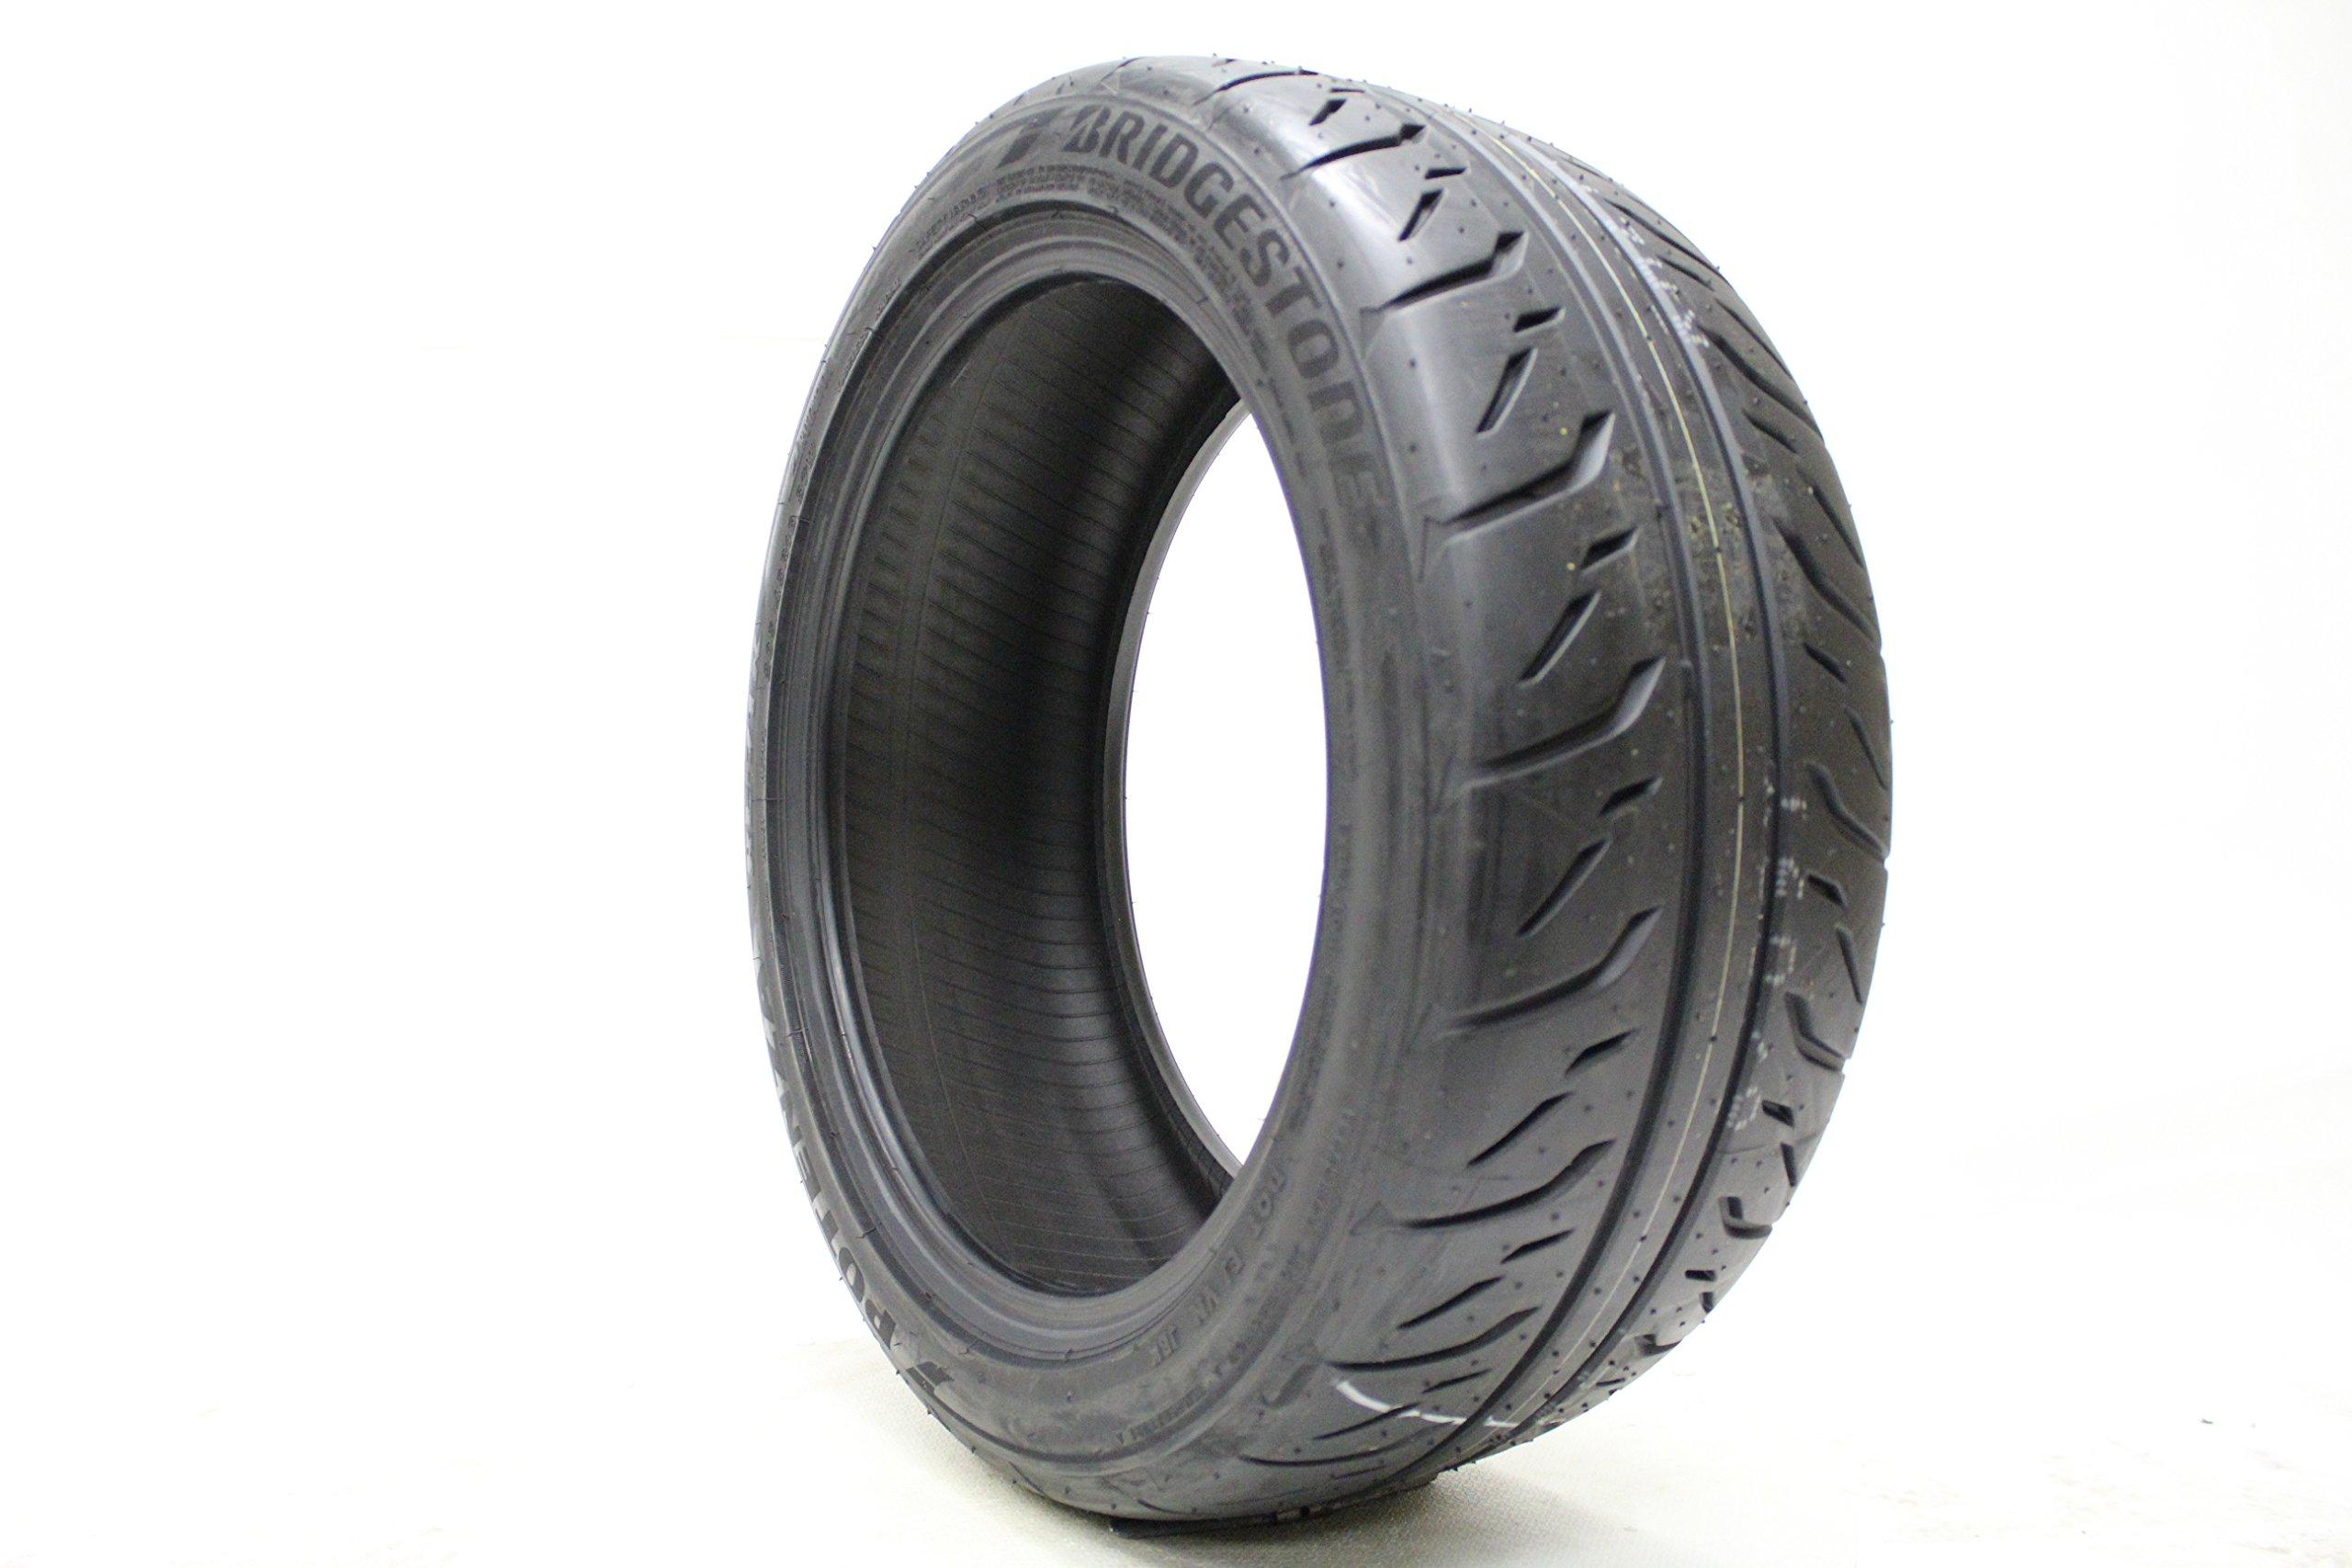 Bridgestone Potenza RE-71R Extreme Summer Performance Tire Radial Tire-255/40R18XL 99W Extra Load-ply